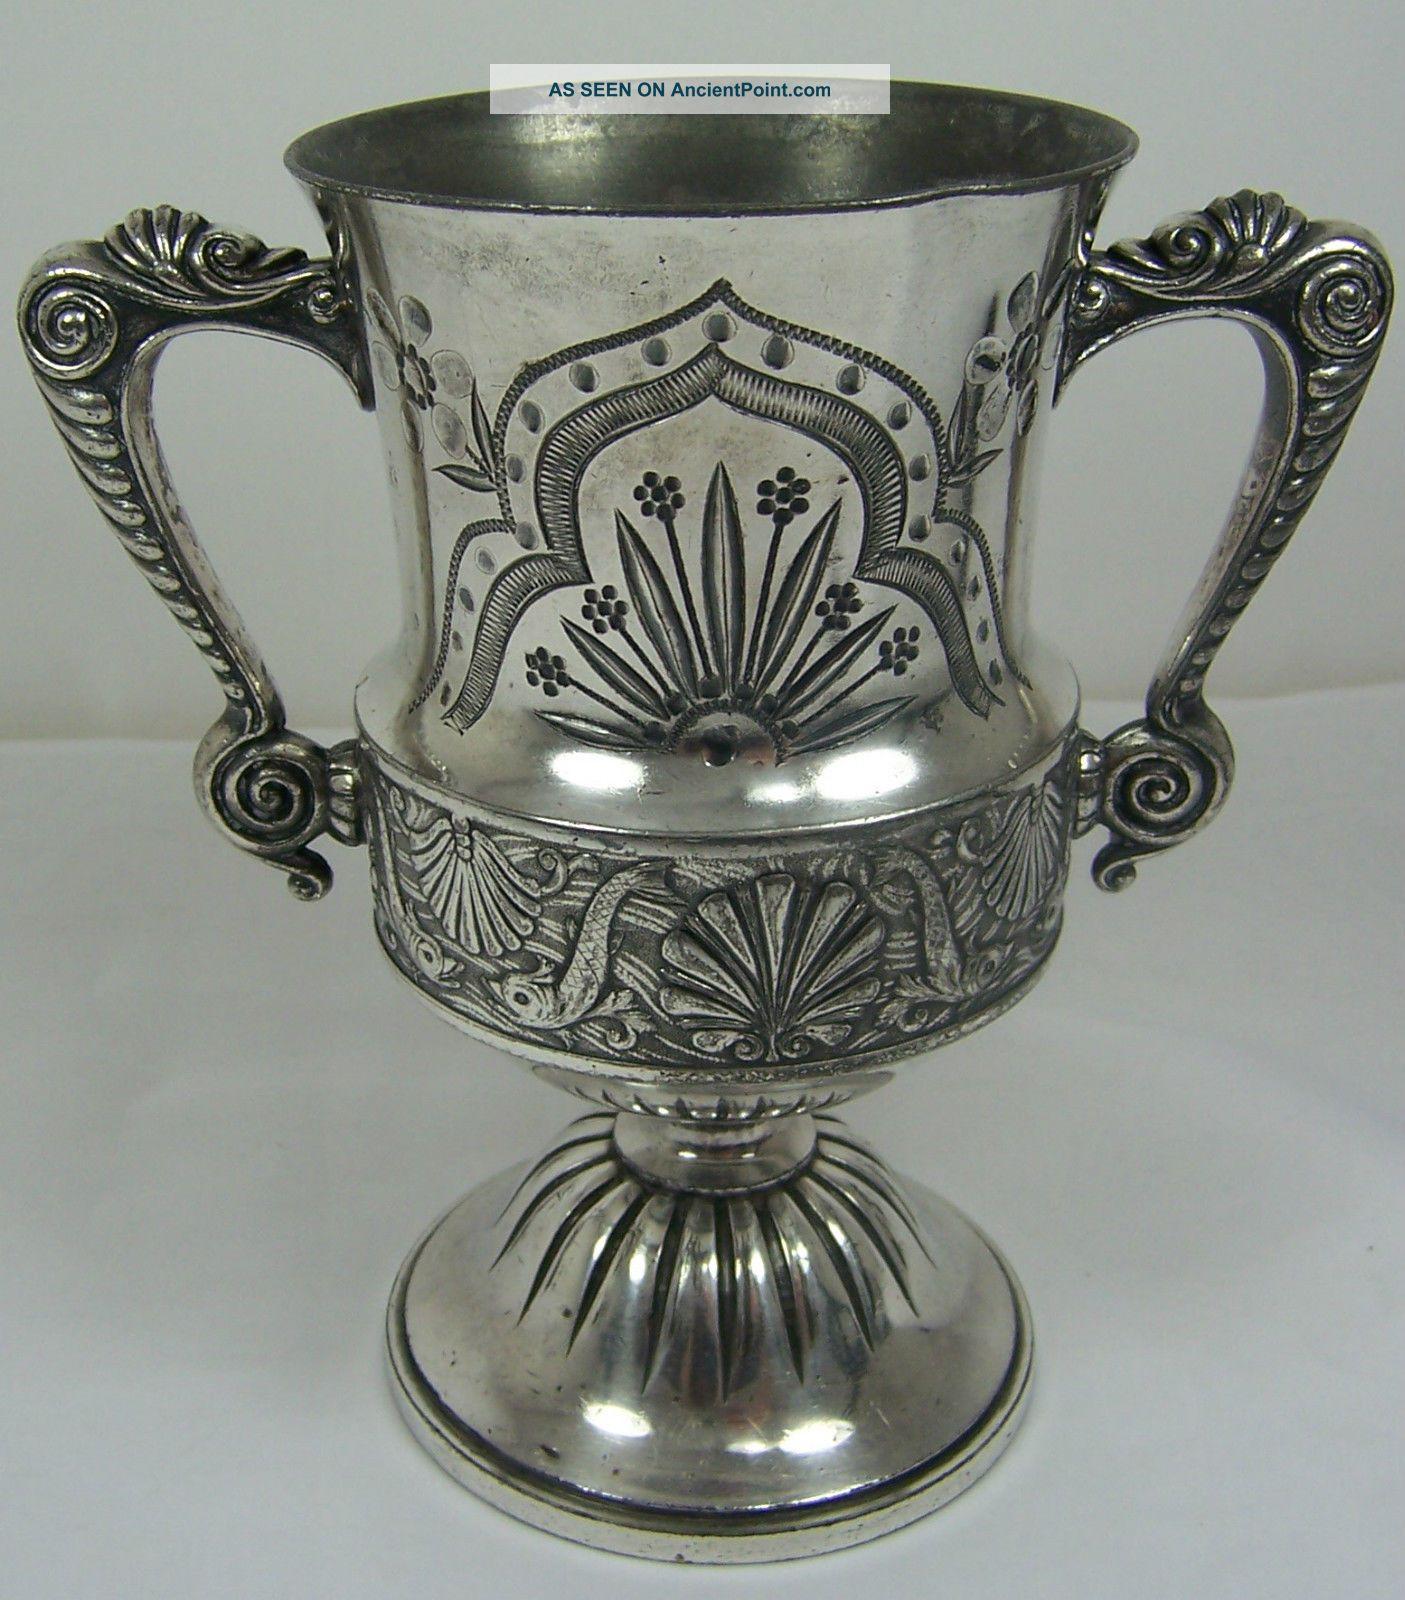 Antique 1800 ' S Meriden Britannia Silver Plate Vase Urn Fish Shell 1464 Pattern Vases & Urns photo